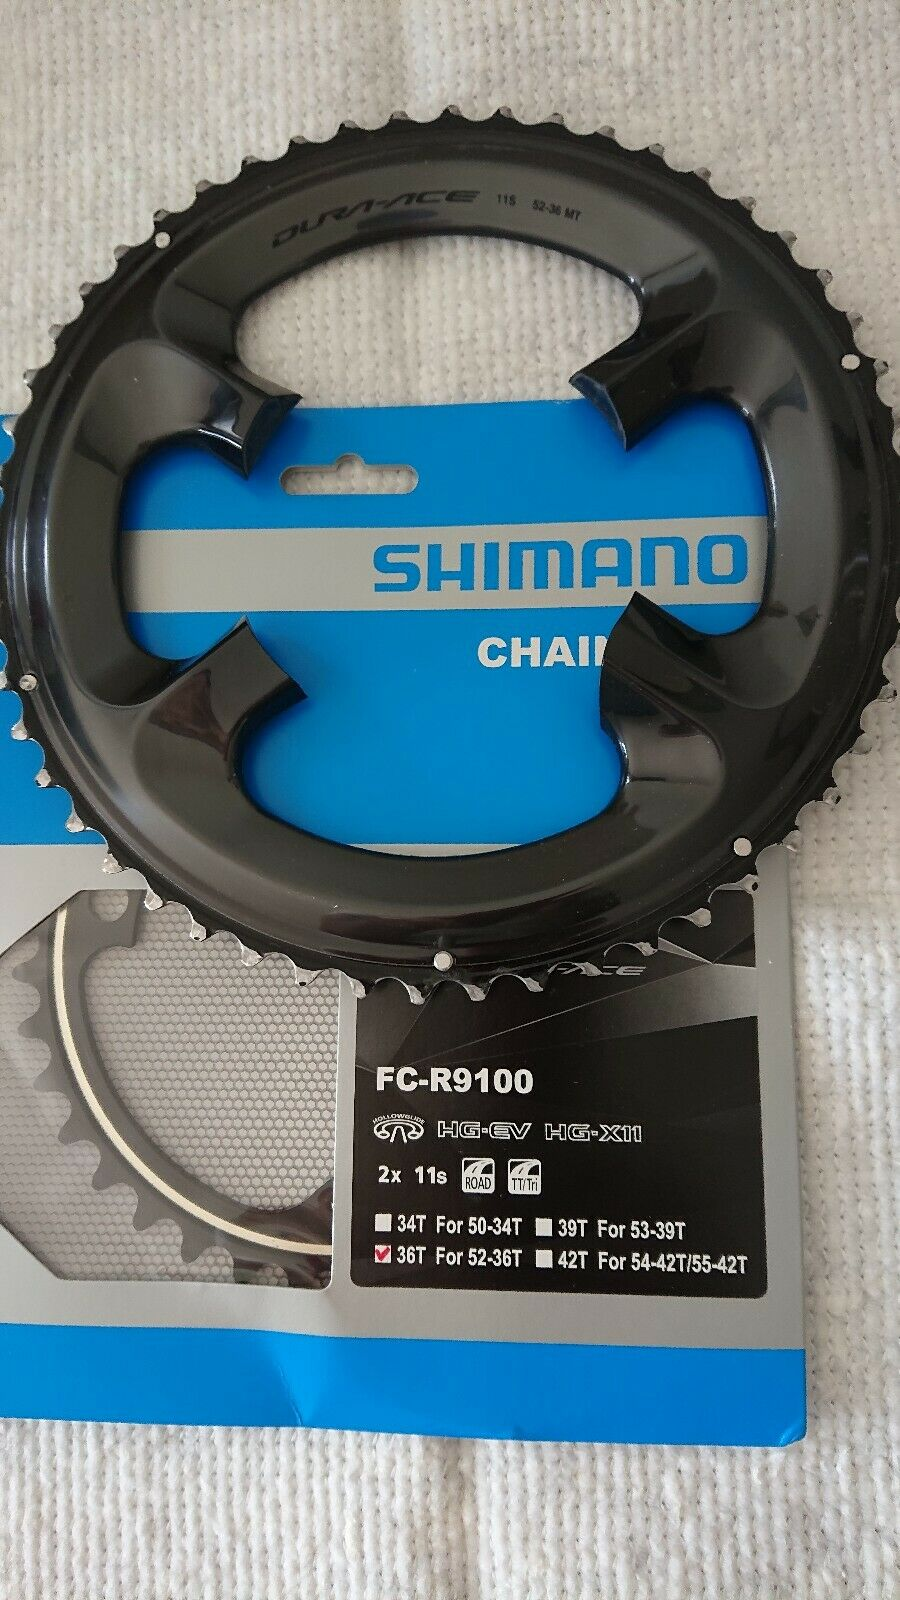 52  36 Shiuomoo Dura Ace 9100 Chainrings Midcompact 4 DuraAce Crankset 9000